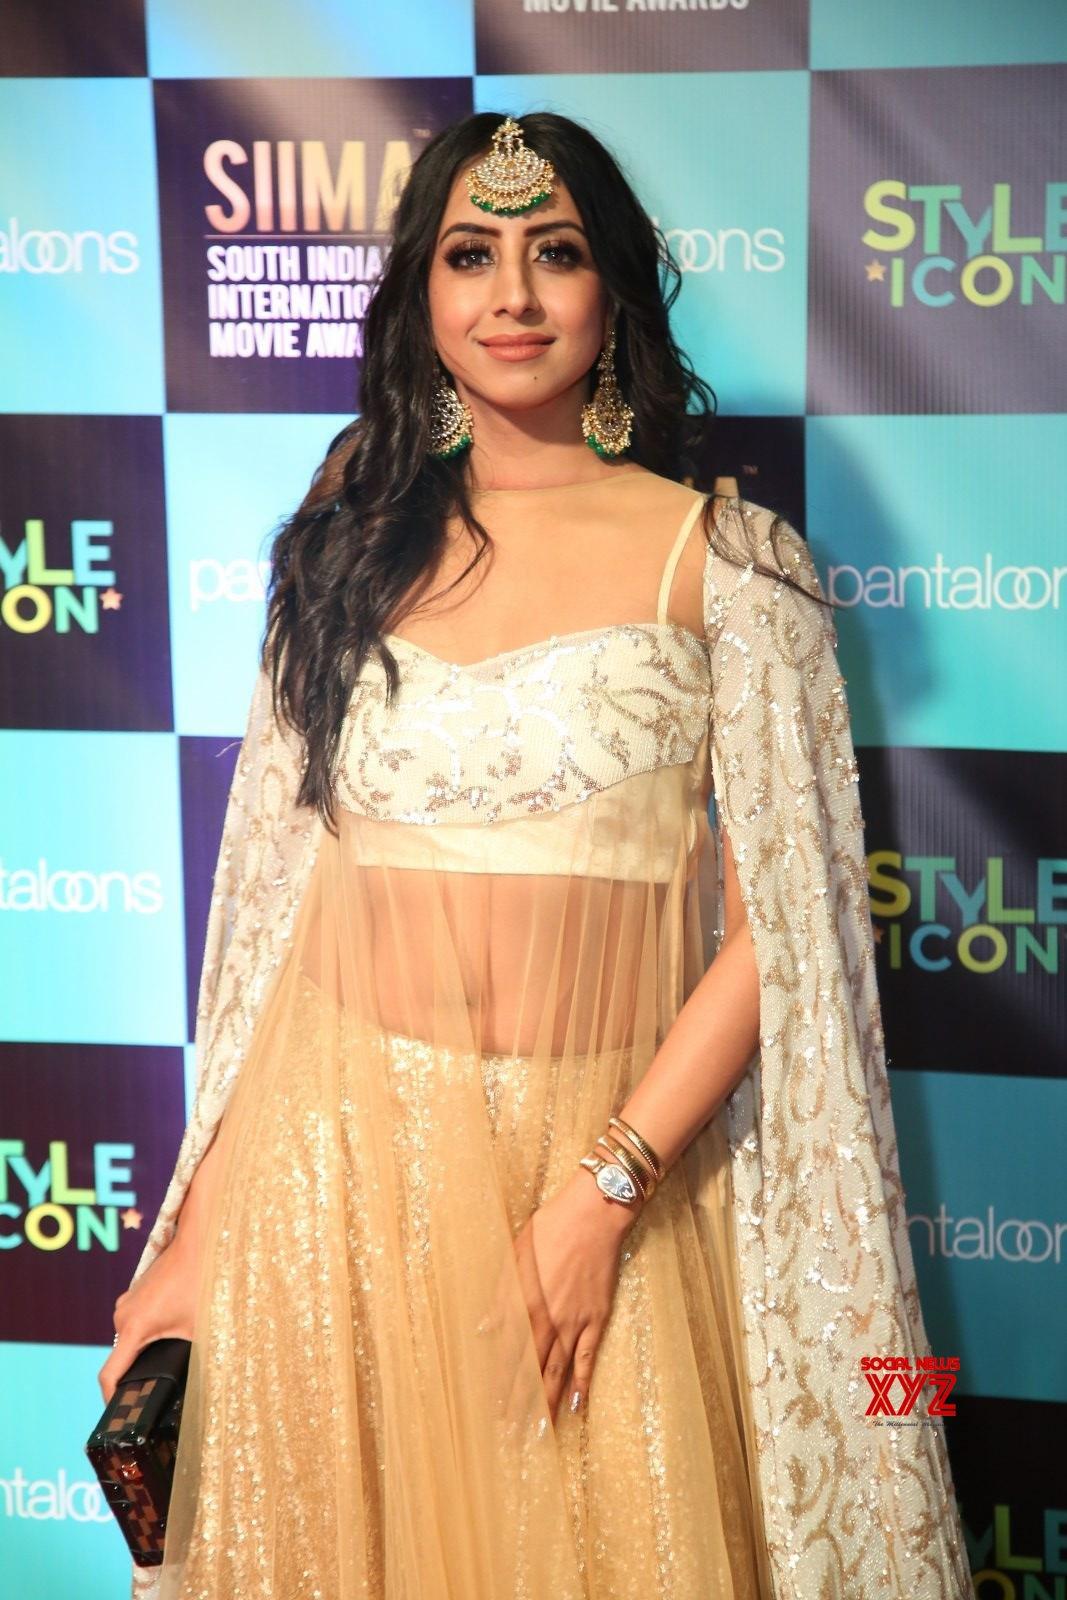 Actress Sanjjanaa Galrani Stills From SIIMA Awards 2019 Red Carpet